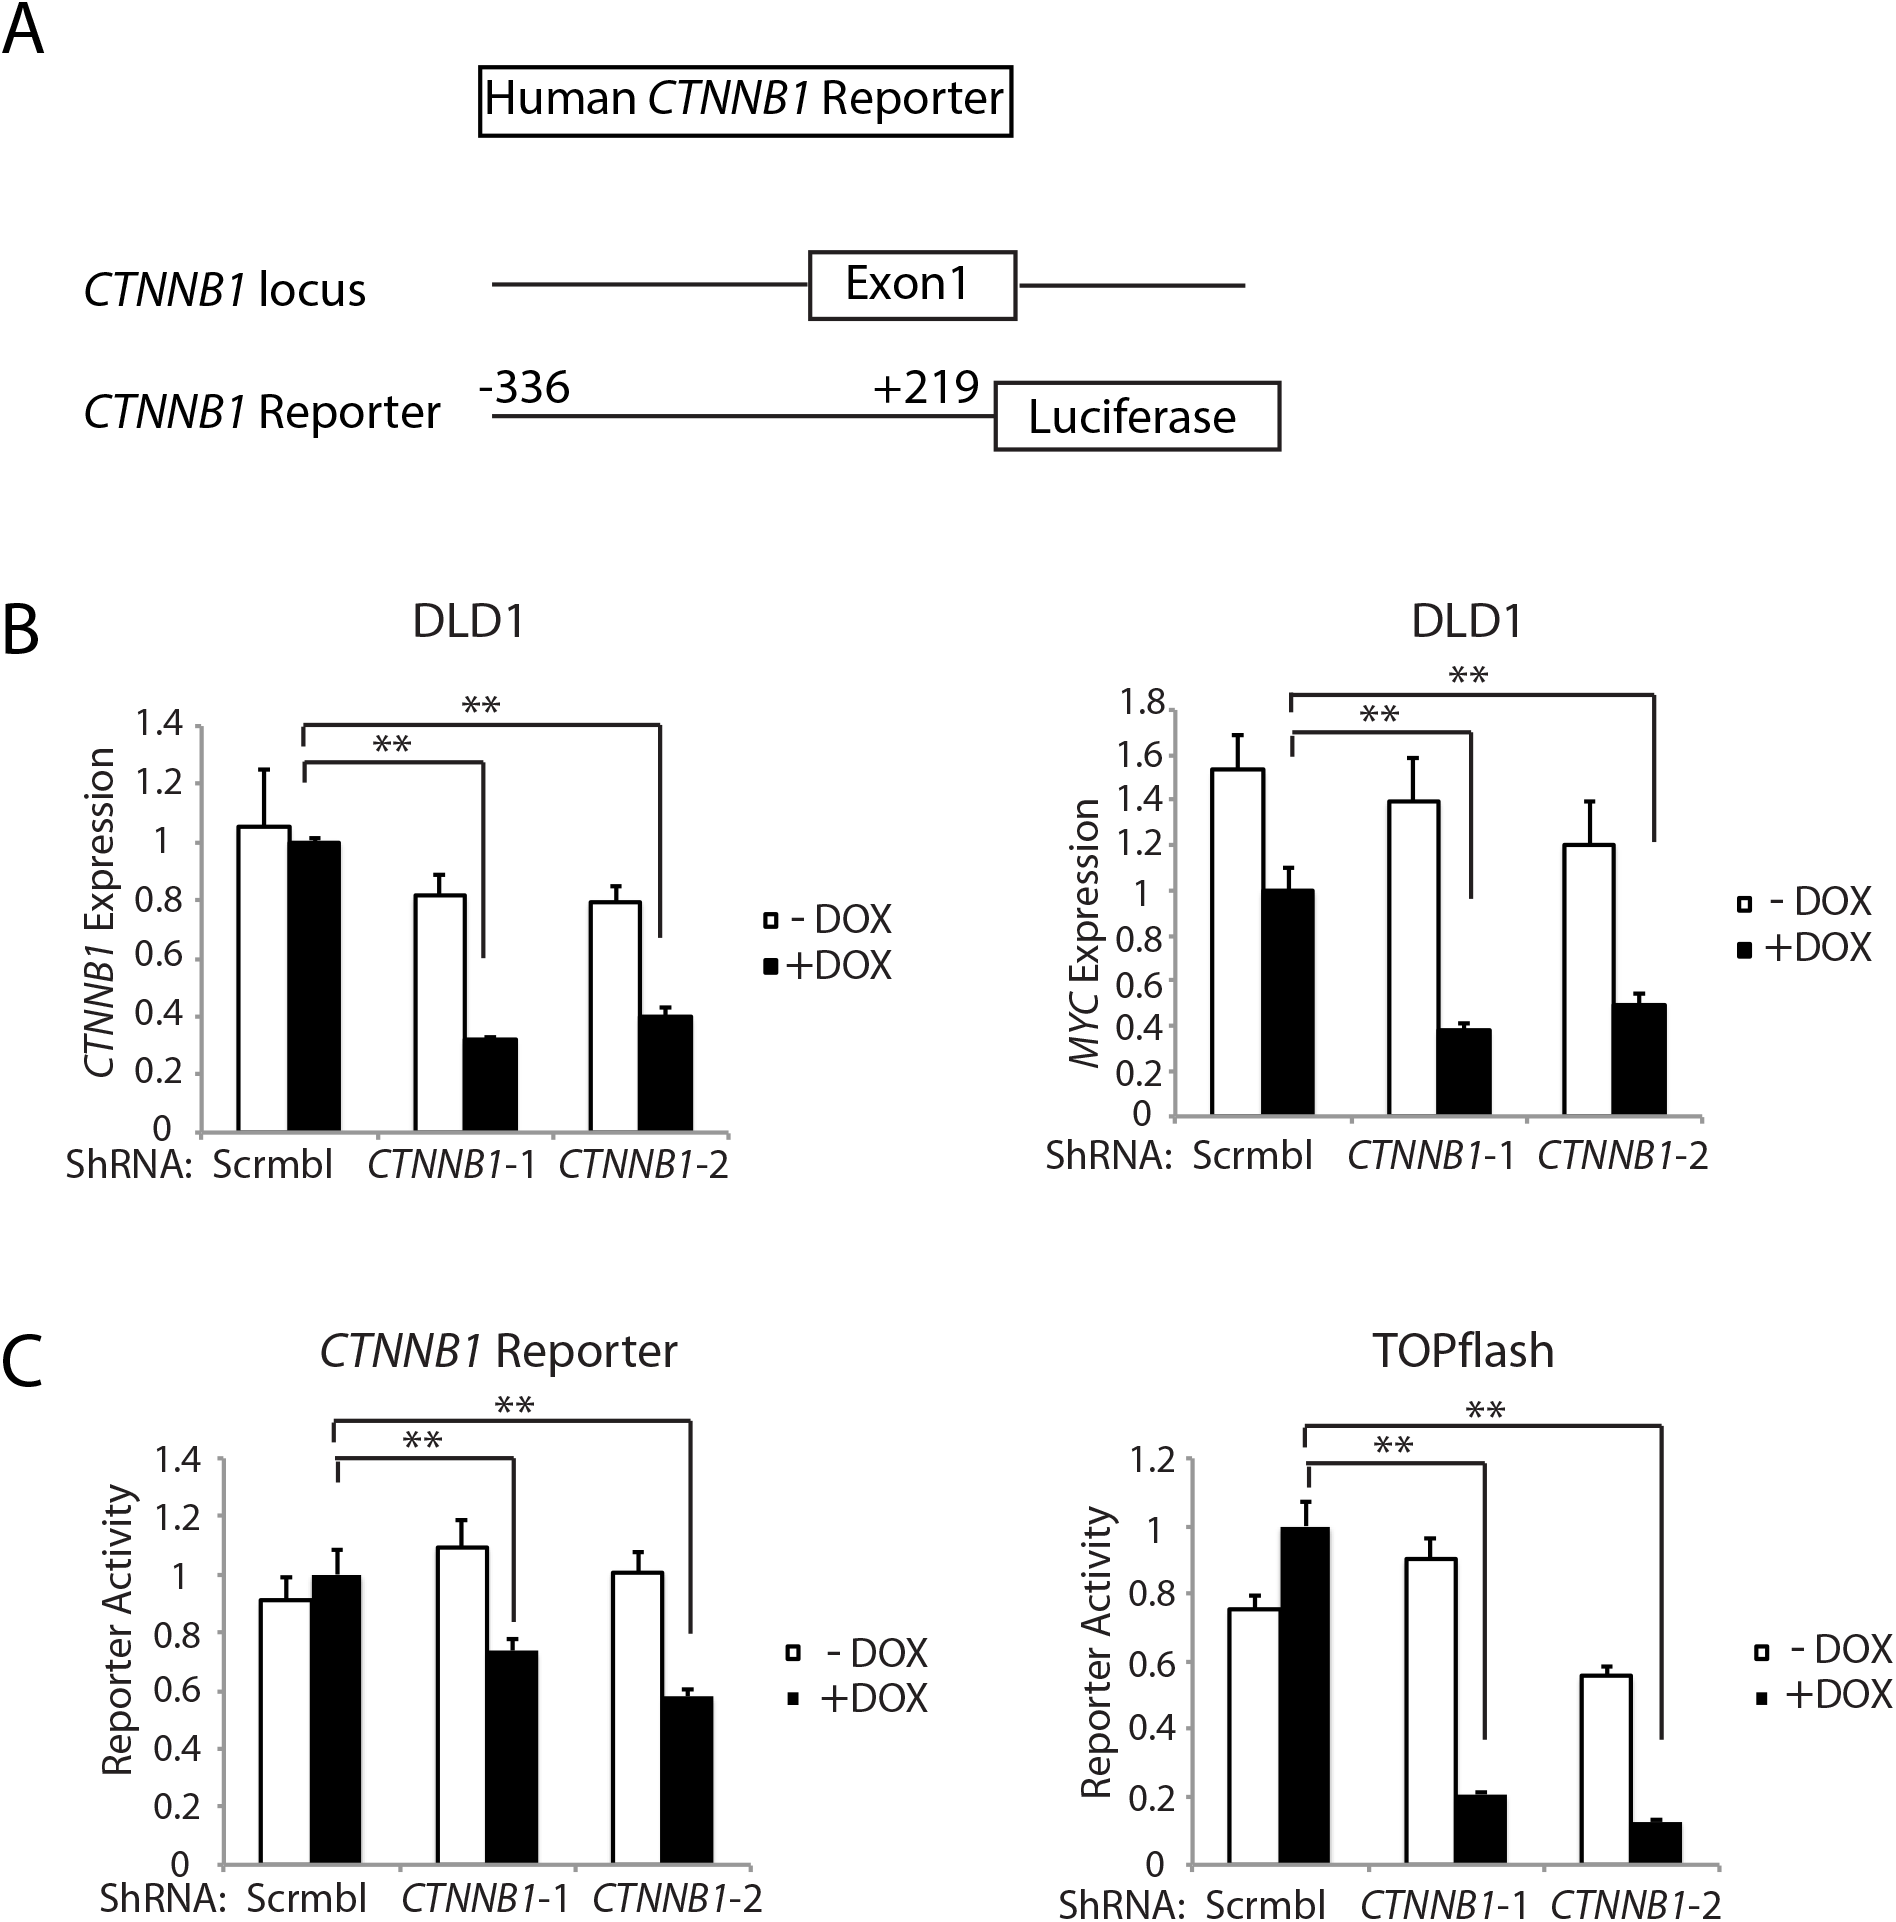 Inhibition of <i>CTNNB1</i> transcript levels affects <i>MYC</i> transcript levels and <i>CTNNB1</i> reporter gene activity in human DLD1 colon cancer cells.